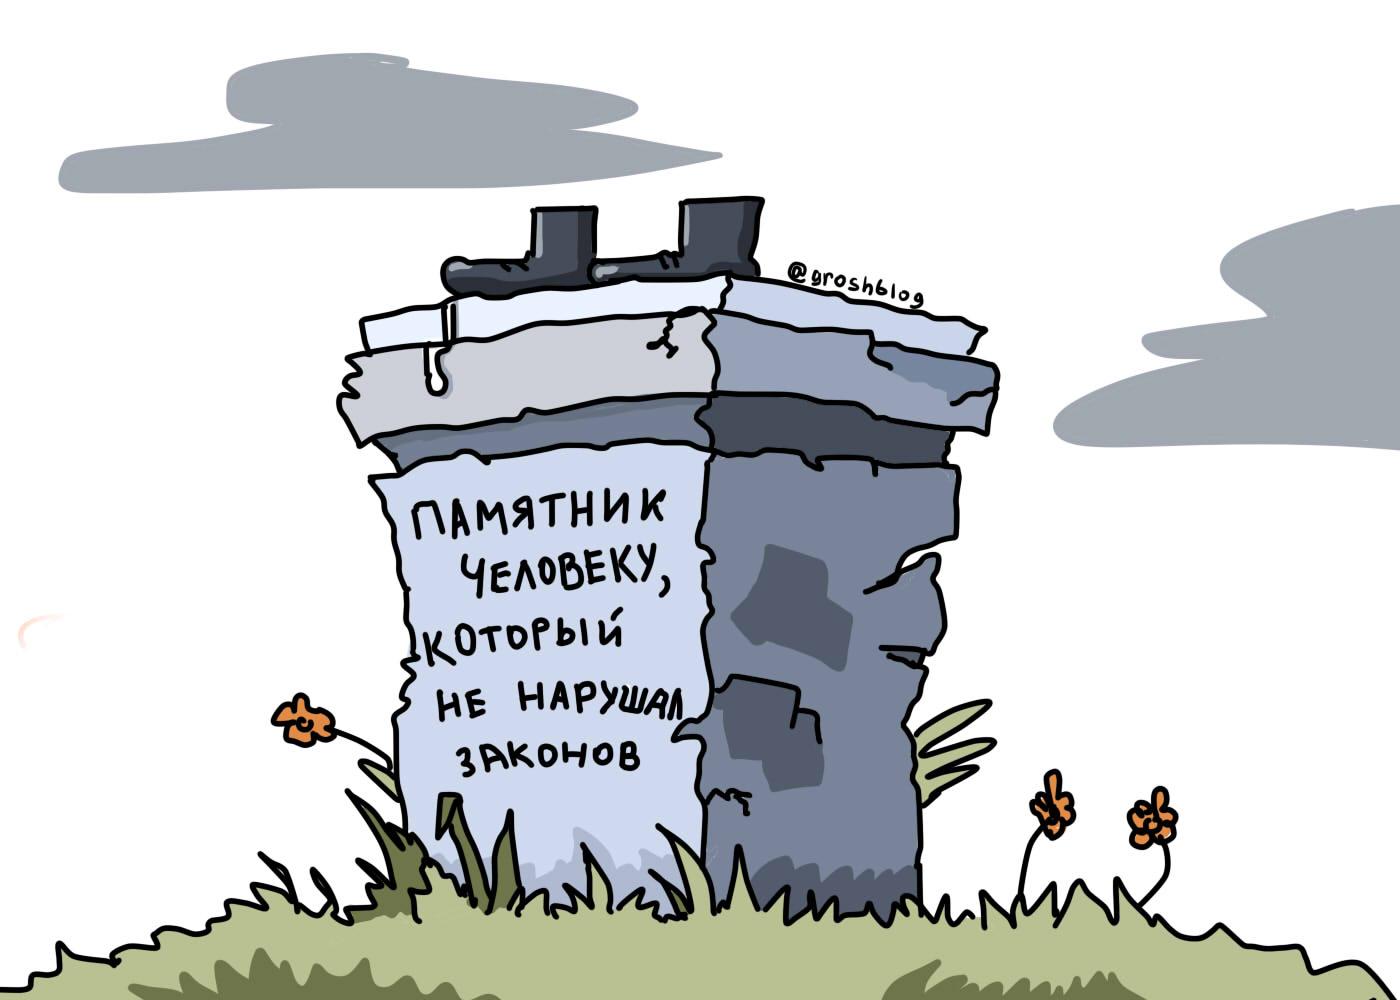 законы которые мы нарушаем журнал грош https://grosh-blog.ru/